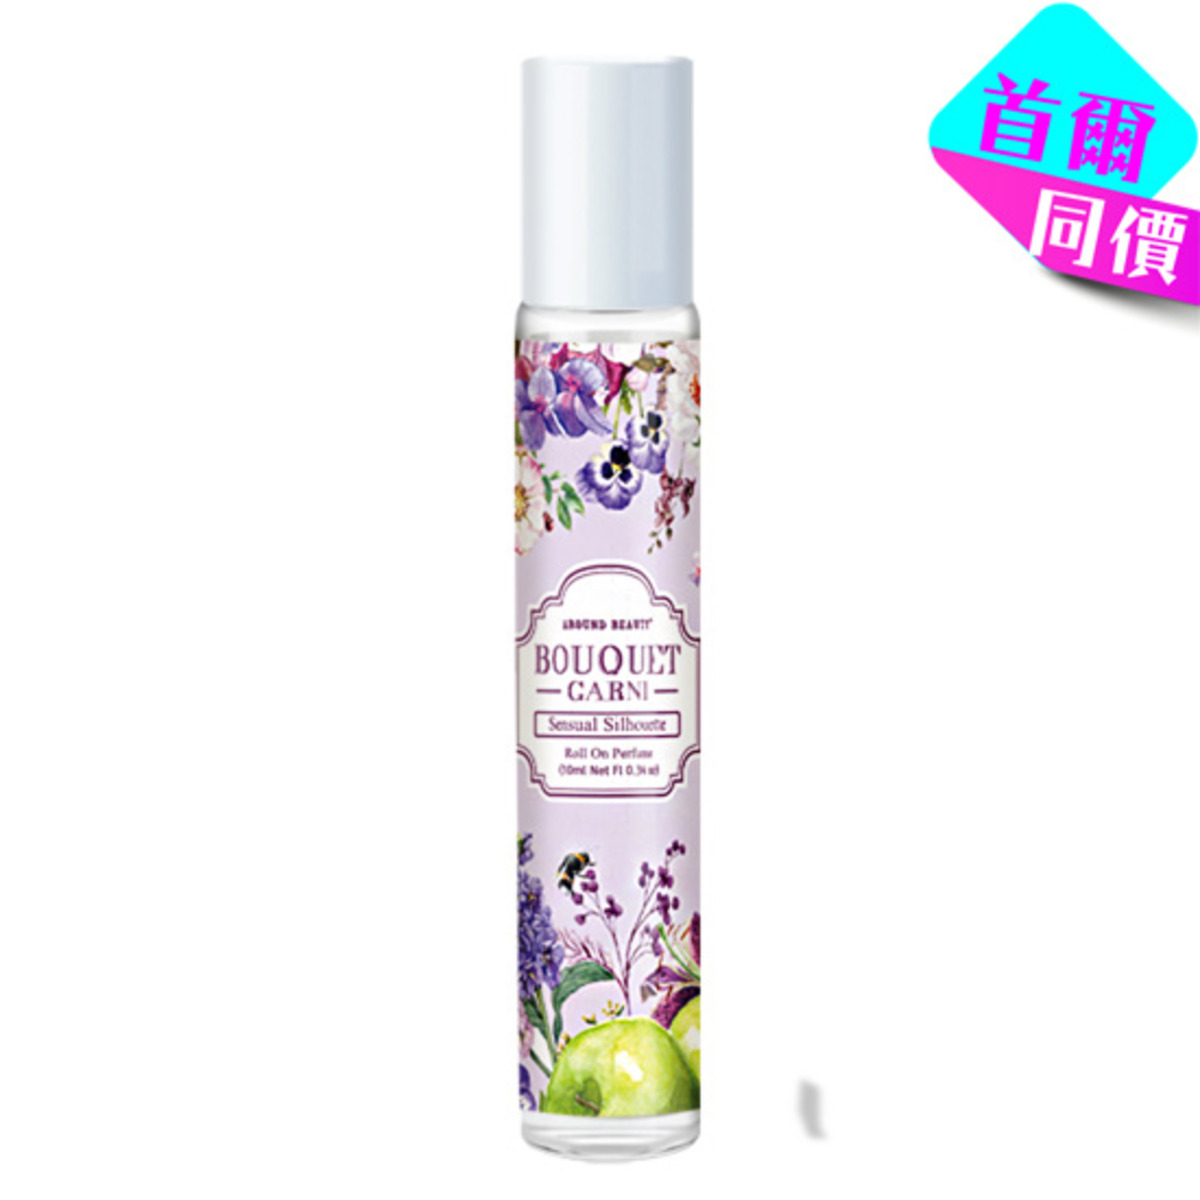 香氛走珠香水  Sensual Silhouette 10ml